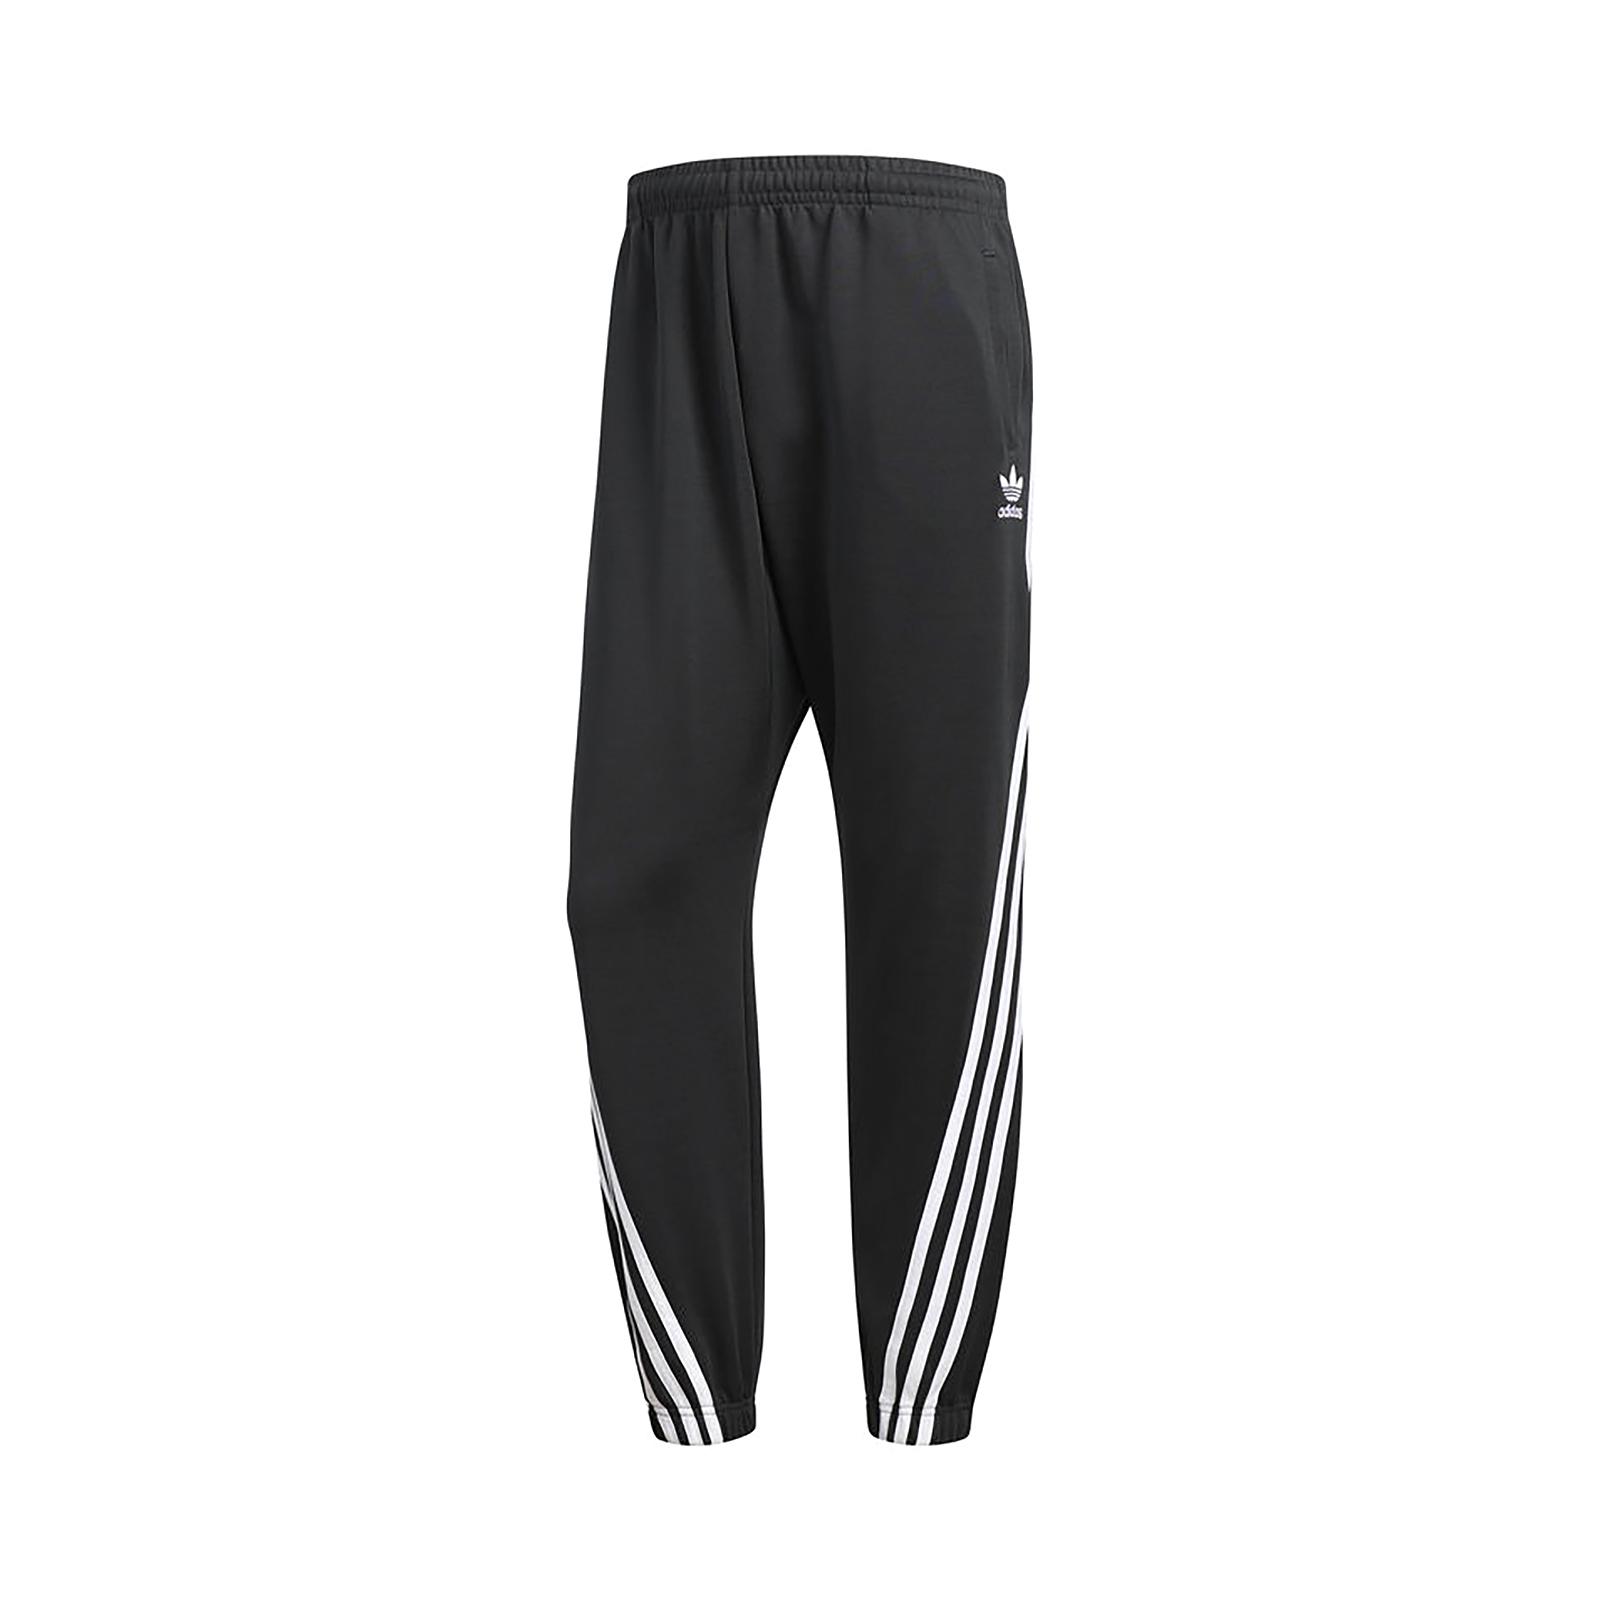 Adidas Pantaloni Wrap Pant Carbon/White Grey Grigio